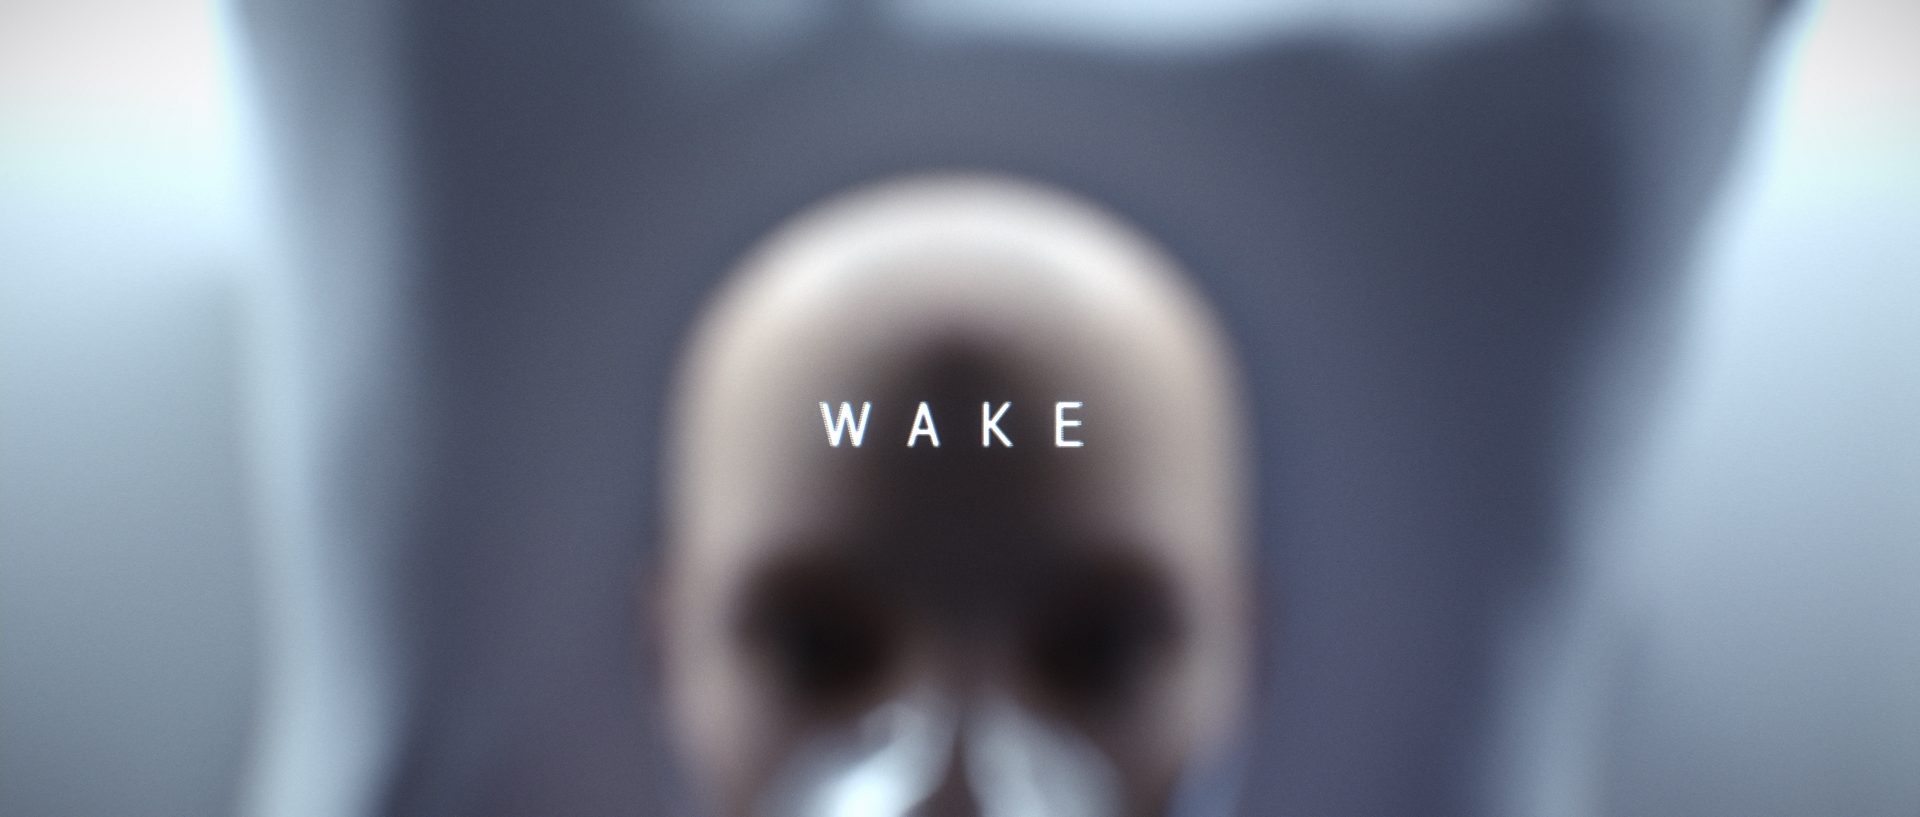 WAKE_STILL_23.png